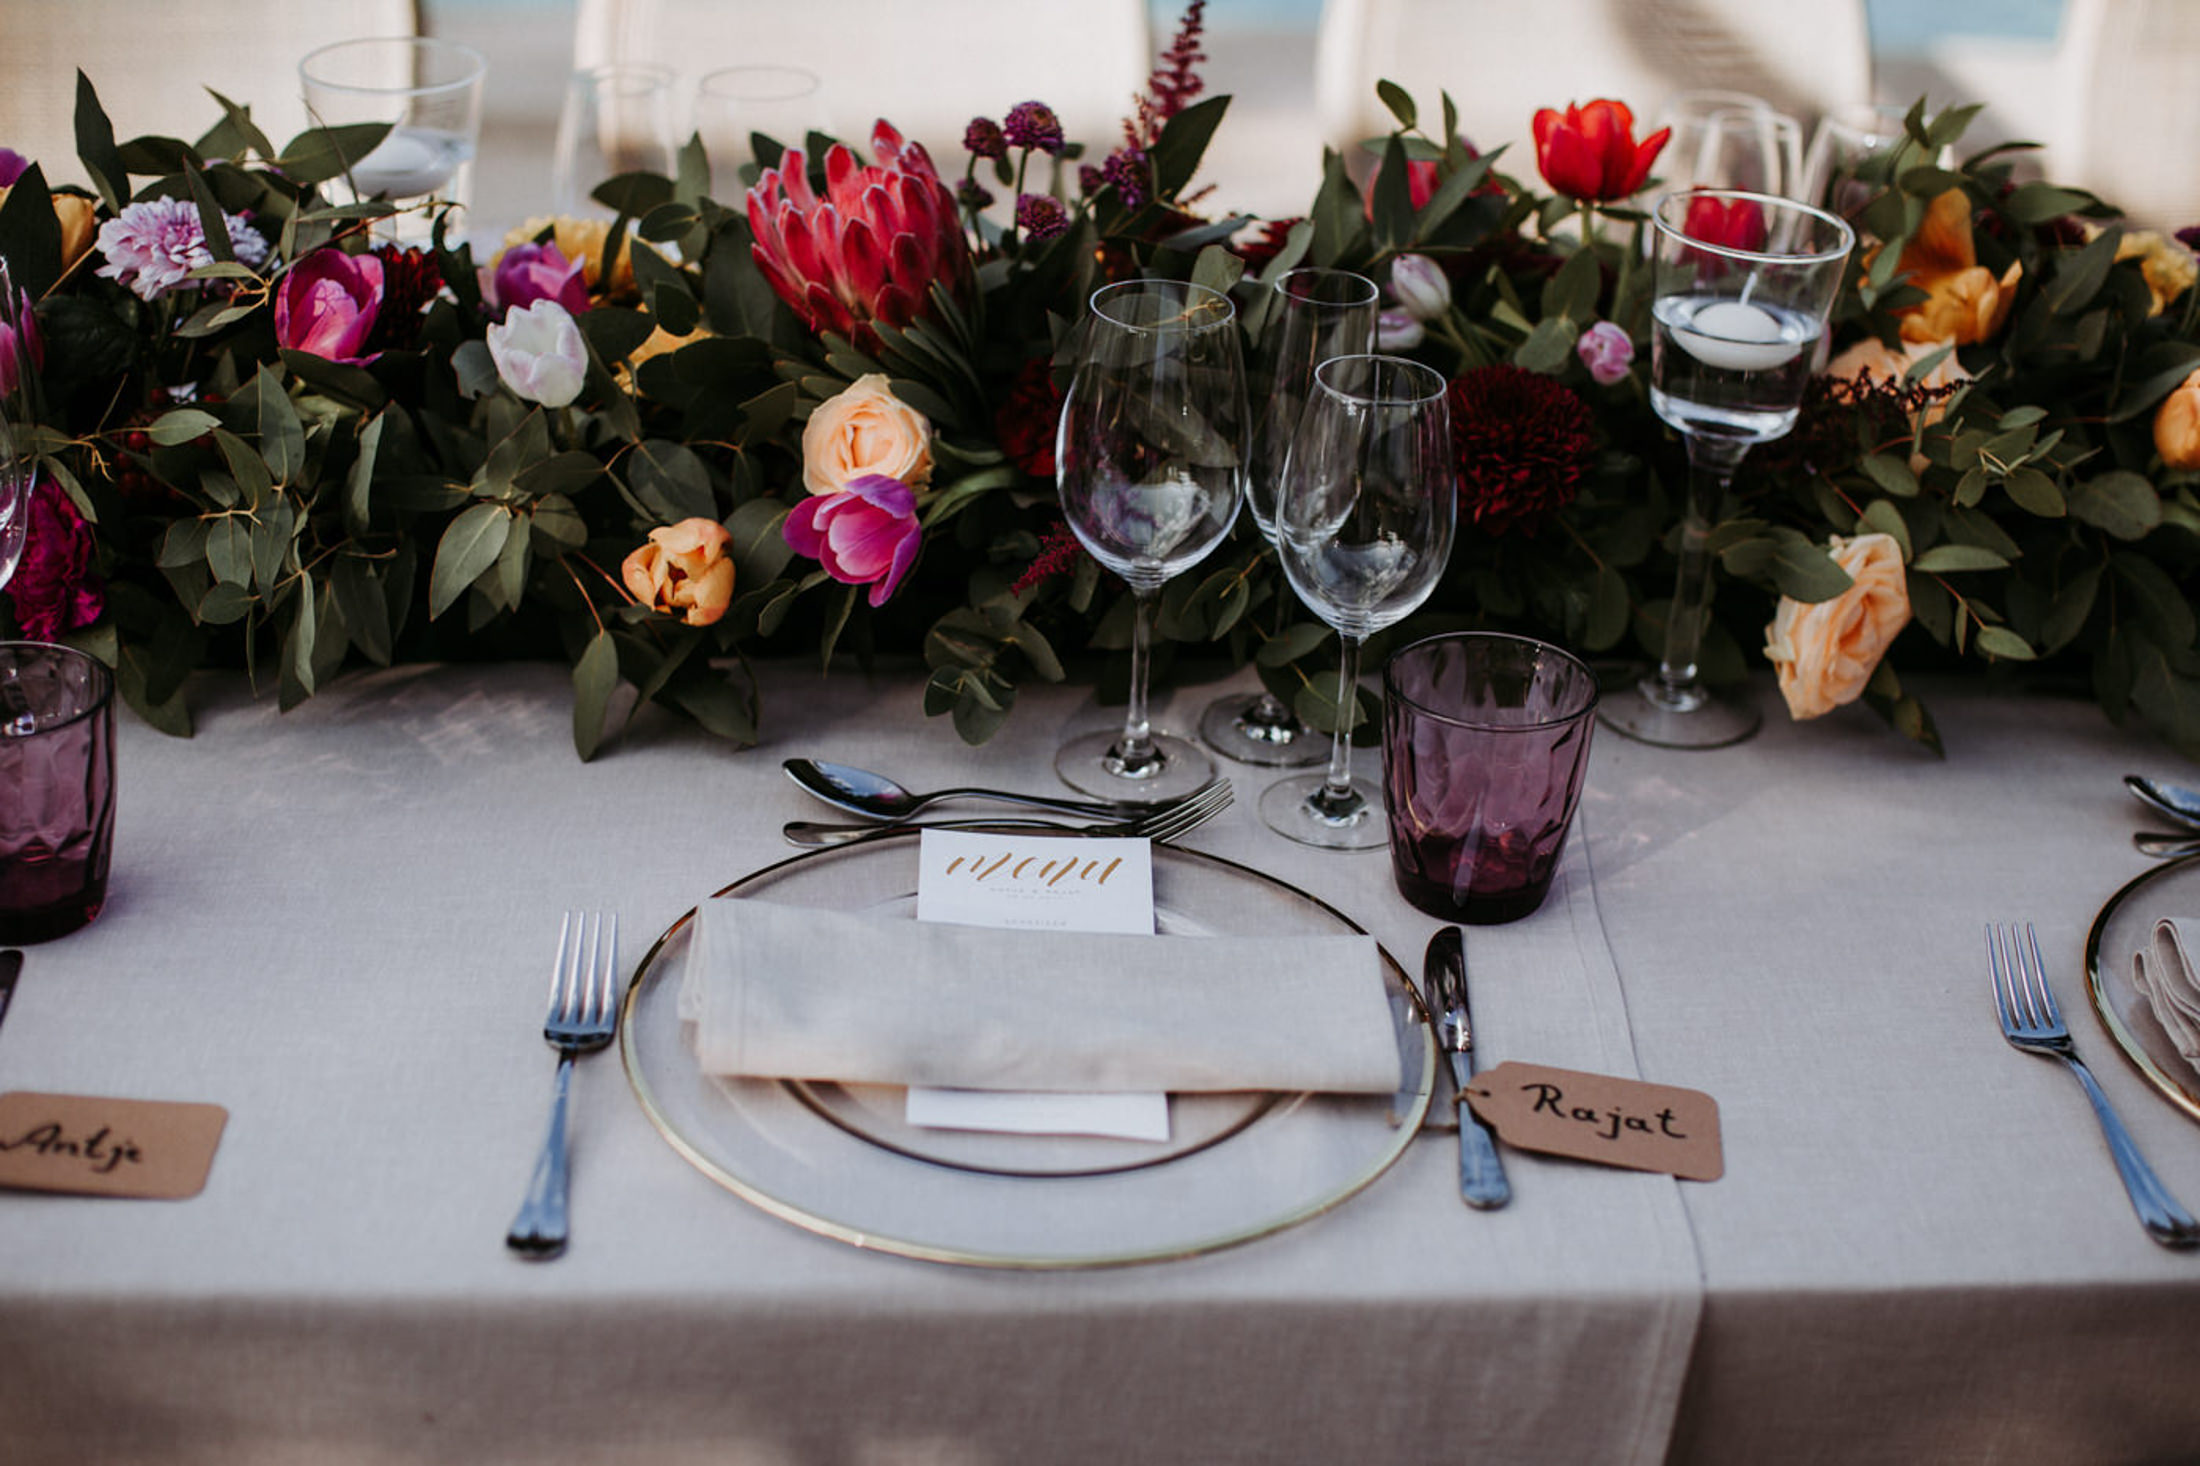 Wedding_Photographer_Mallorca_Daniela-Marquardt_Photography_New_York_Iceland_Tuscany_Santorini_Portugal_Austria_Bavaria_Elopement_Hochzeitsfotograf_AntjeRajat2_98